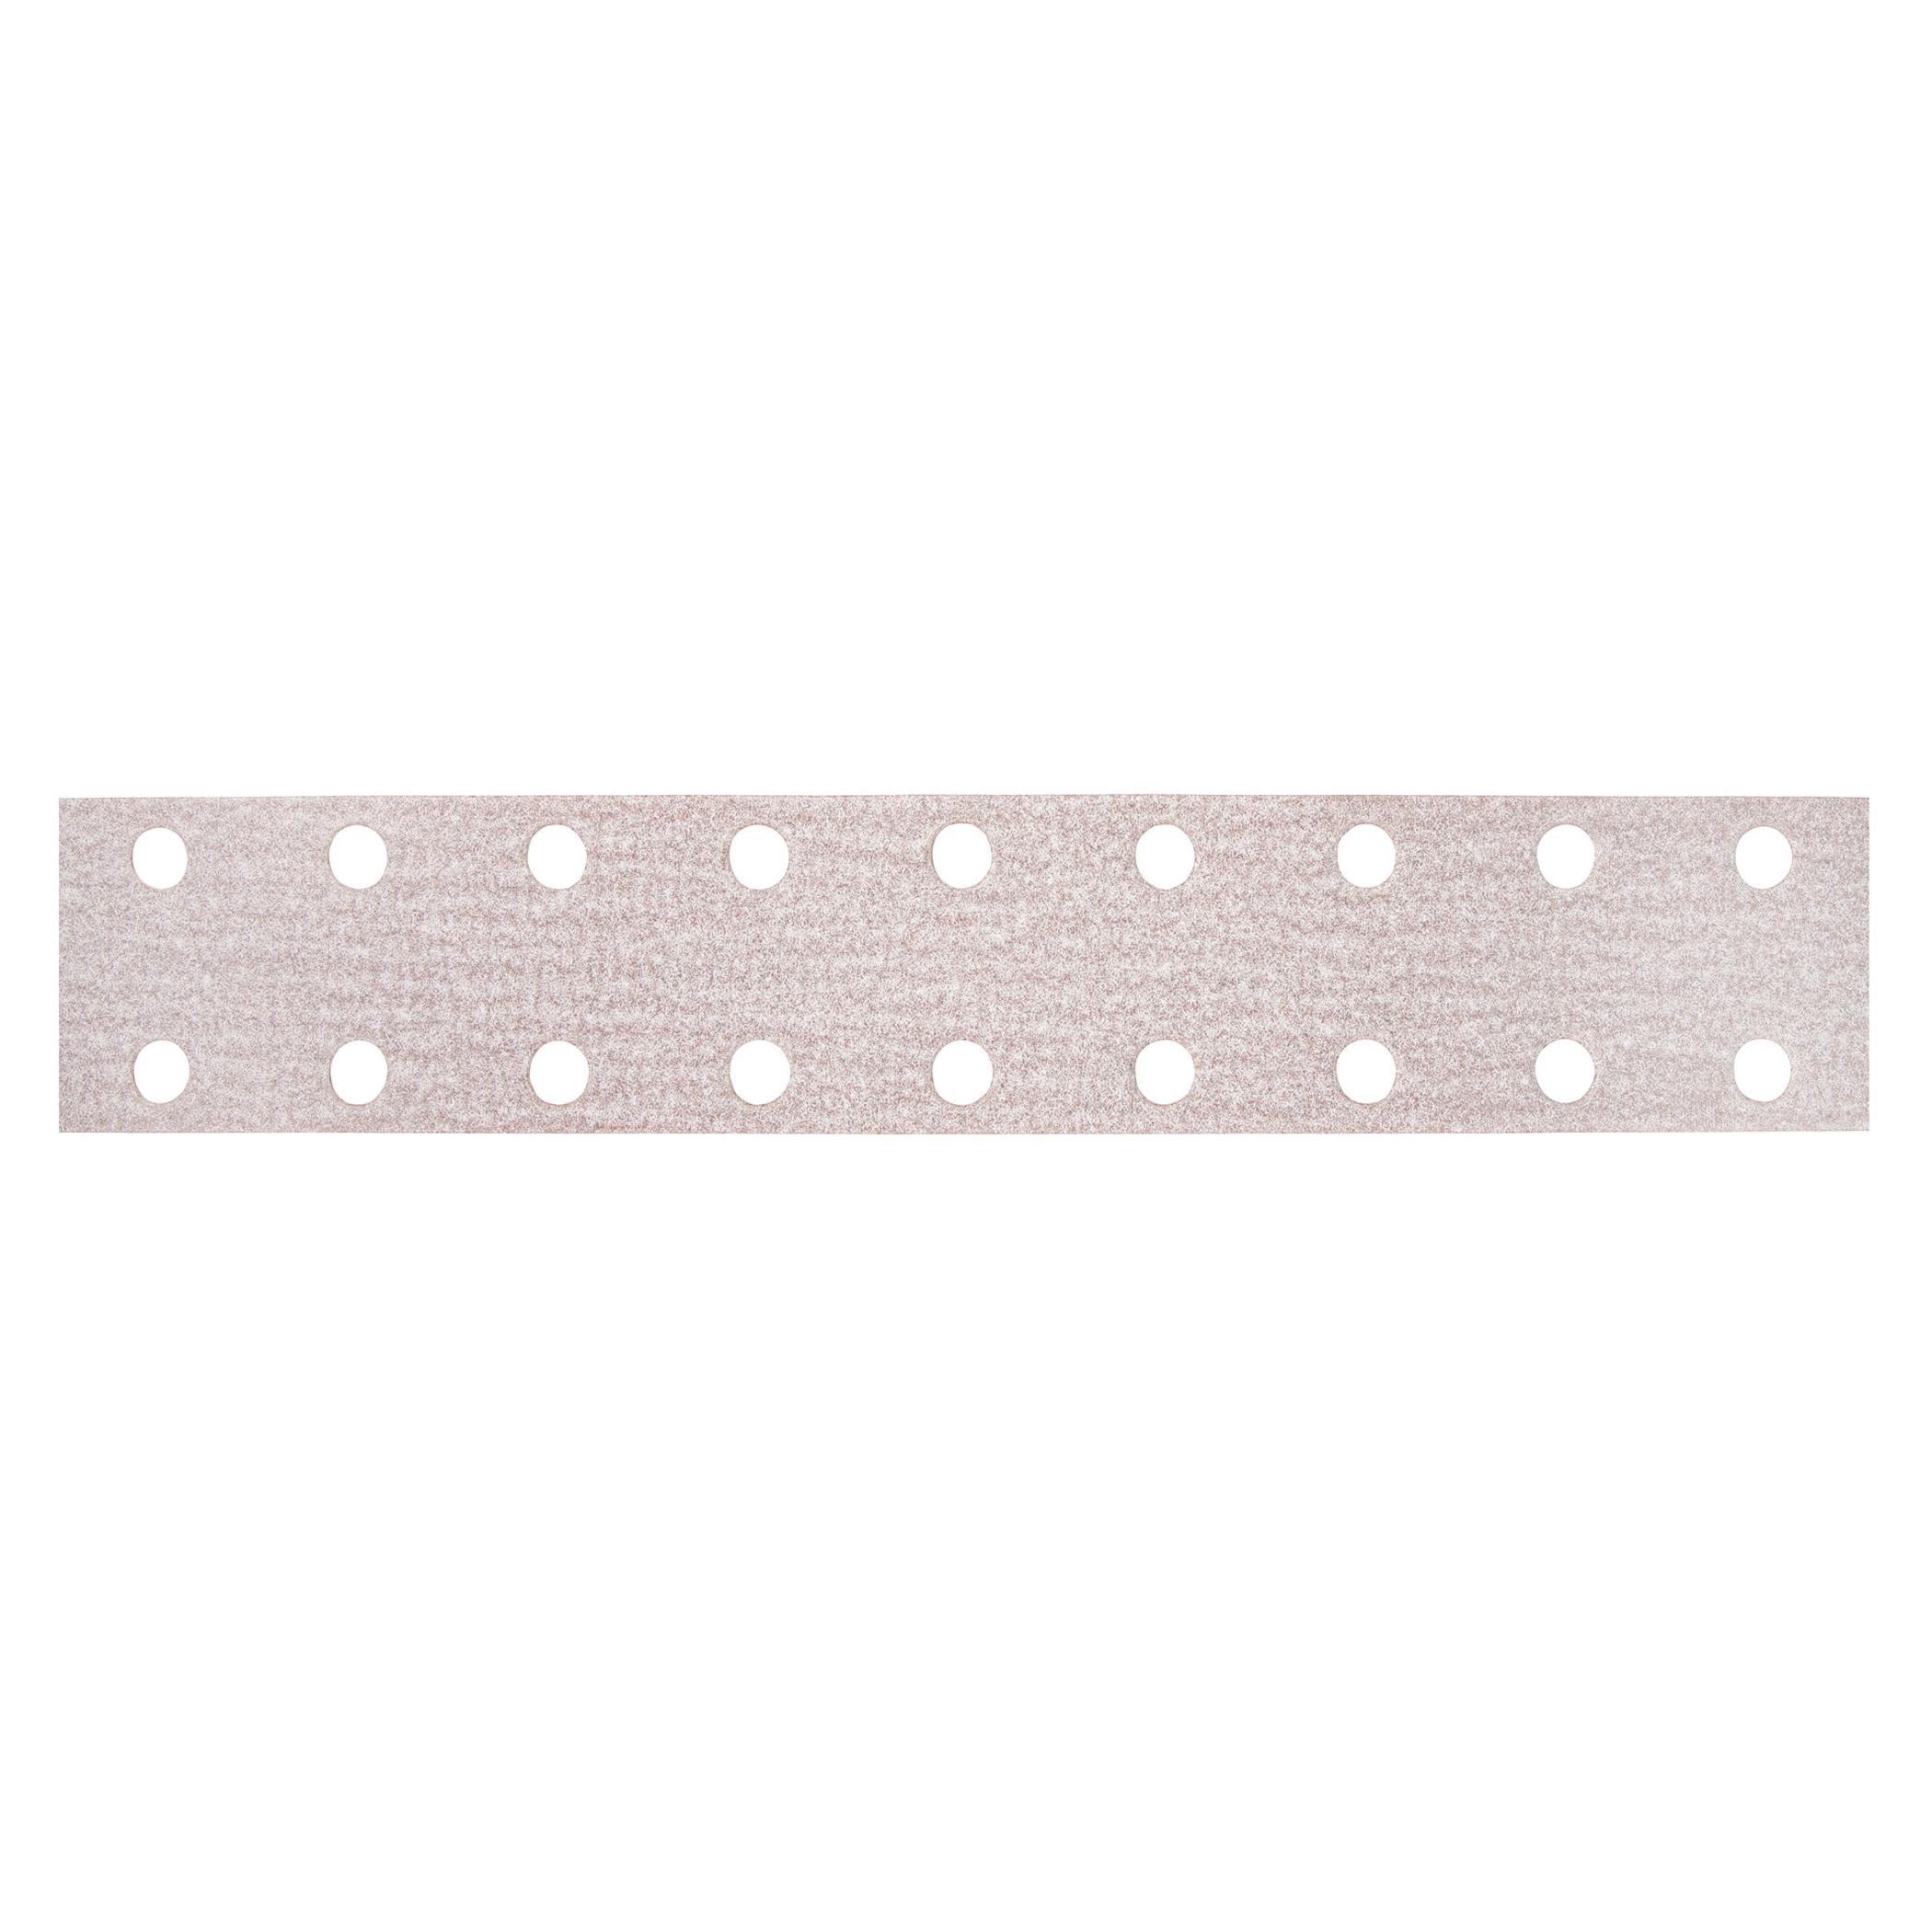 Norton® 66261131654 A275OP Vacuum Coated File Strip, 16 in L x 2-3/4 in W, P180 Grit, Fine Grade, Aluminum Oxide Abrasive, Anti-Loading Paper Backing